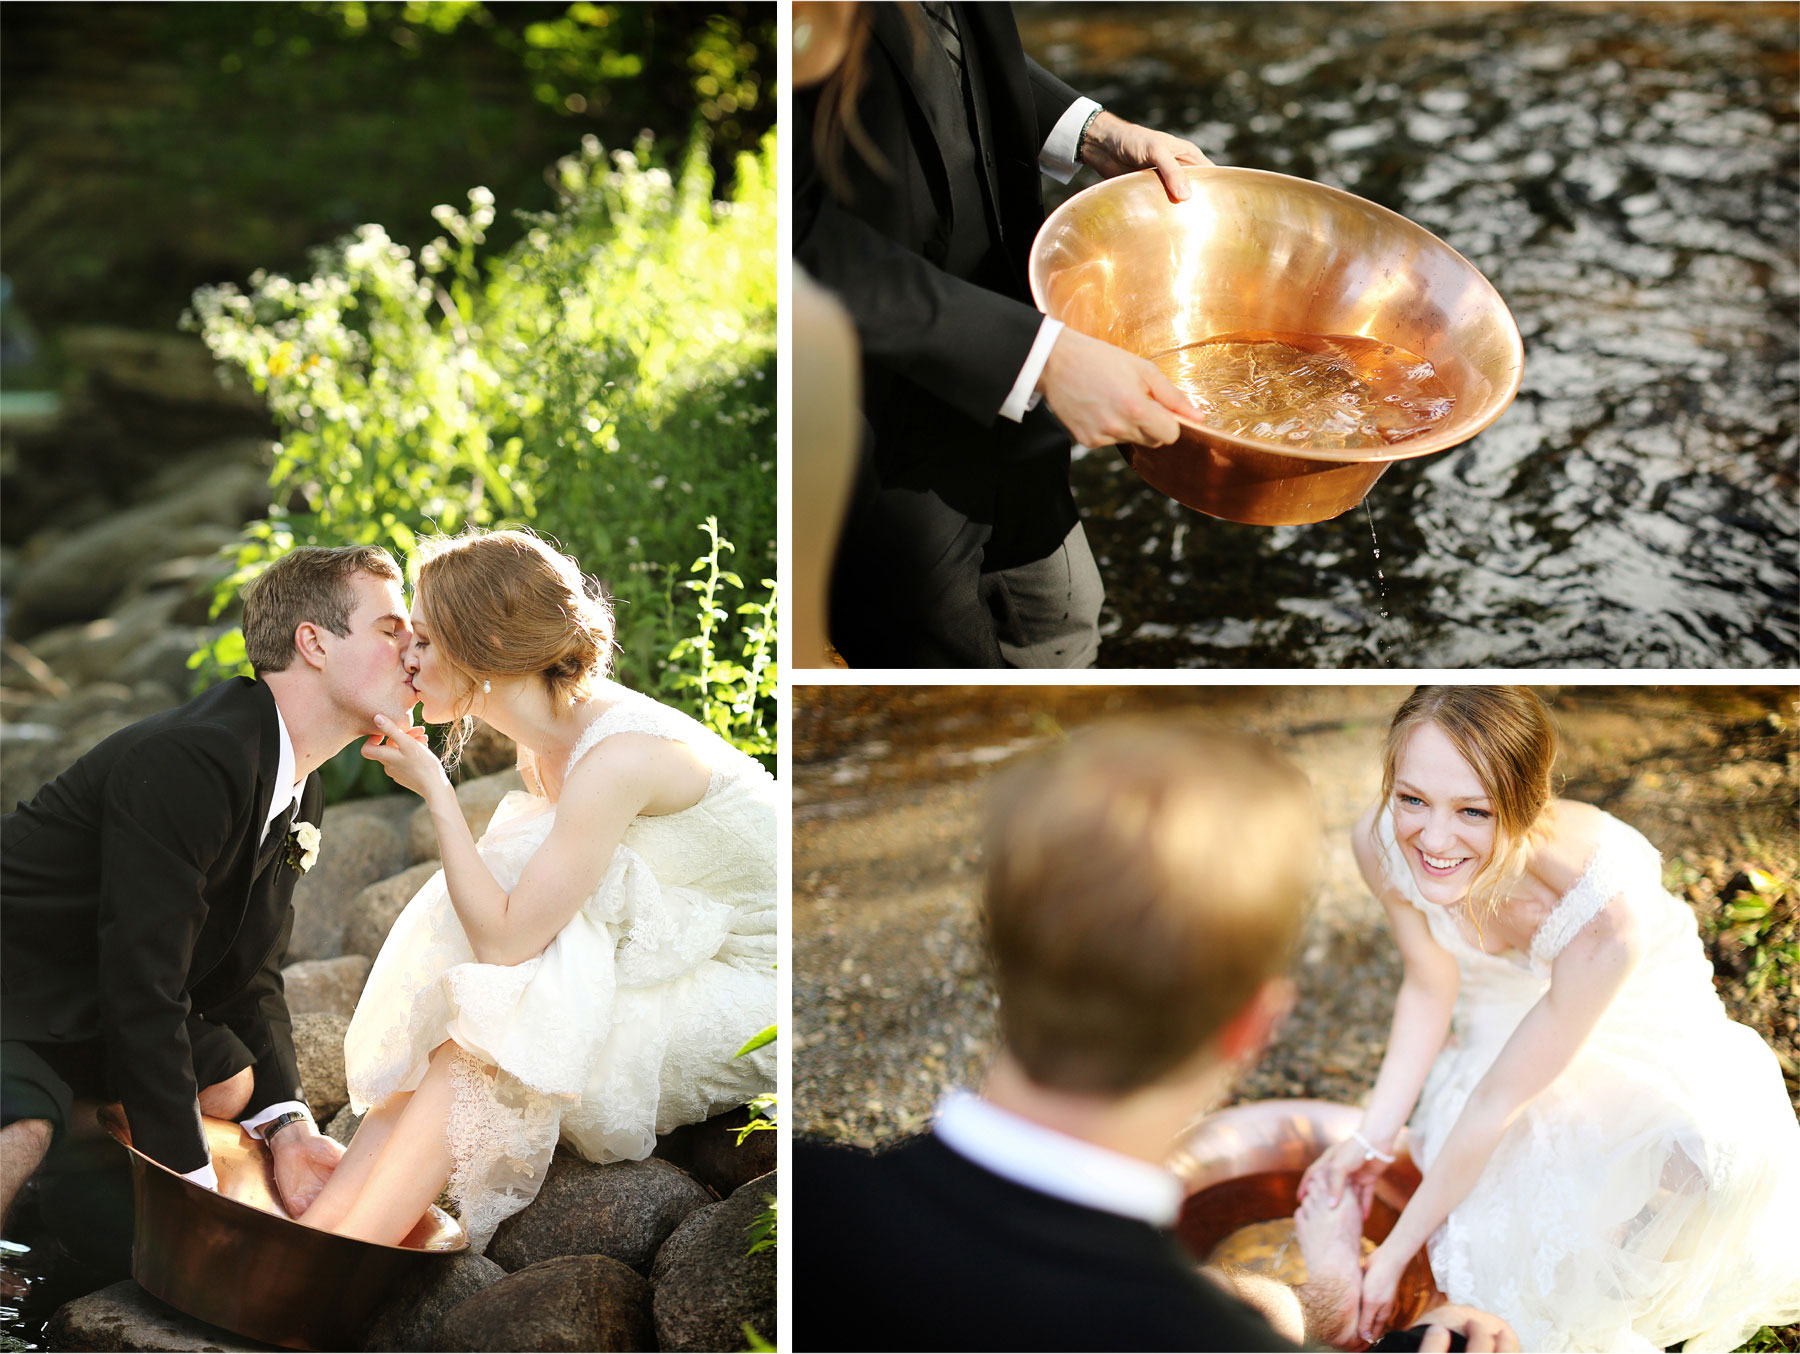 23-Edina-Minnesota-Wedding-Photographer-by-Andrew-Vick-Photography-Summer-Bride-Groom-Ceremonial-Foot-Washing-Copper-Bowl-Kiss-Creek-Betsy-and-Jon.jpg